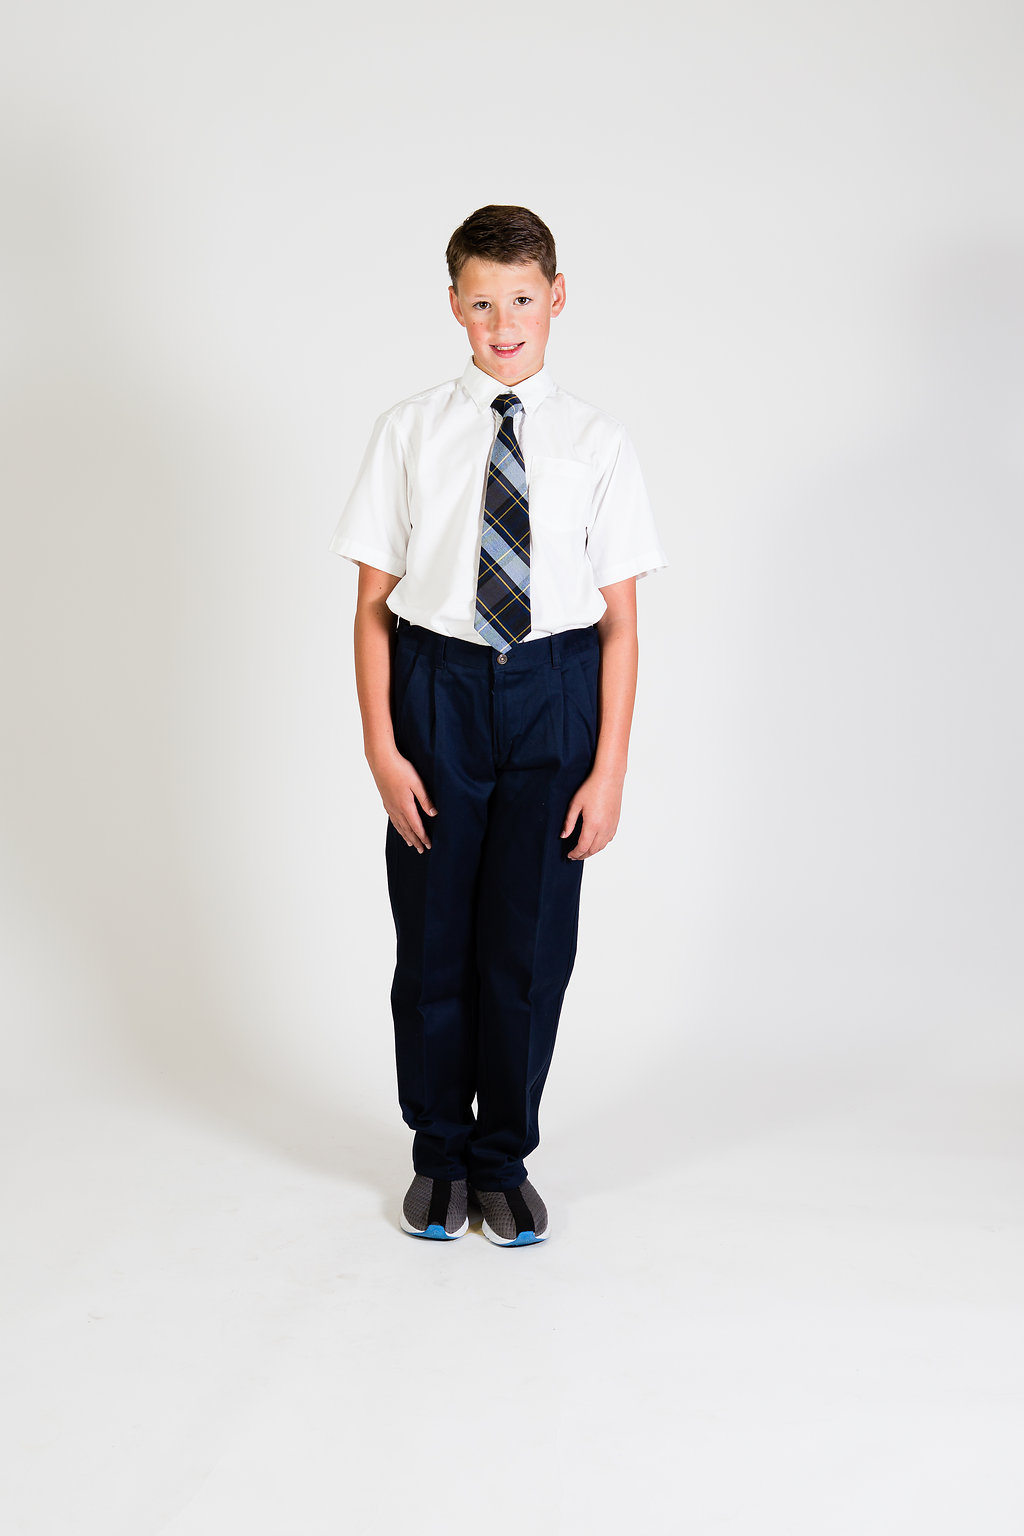 16JuneWCA_Uniforms171-Edit.jpg